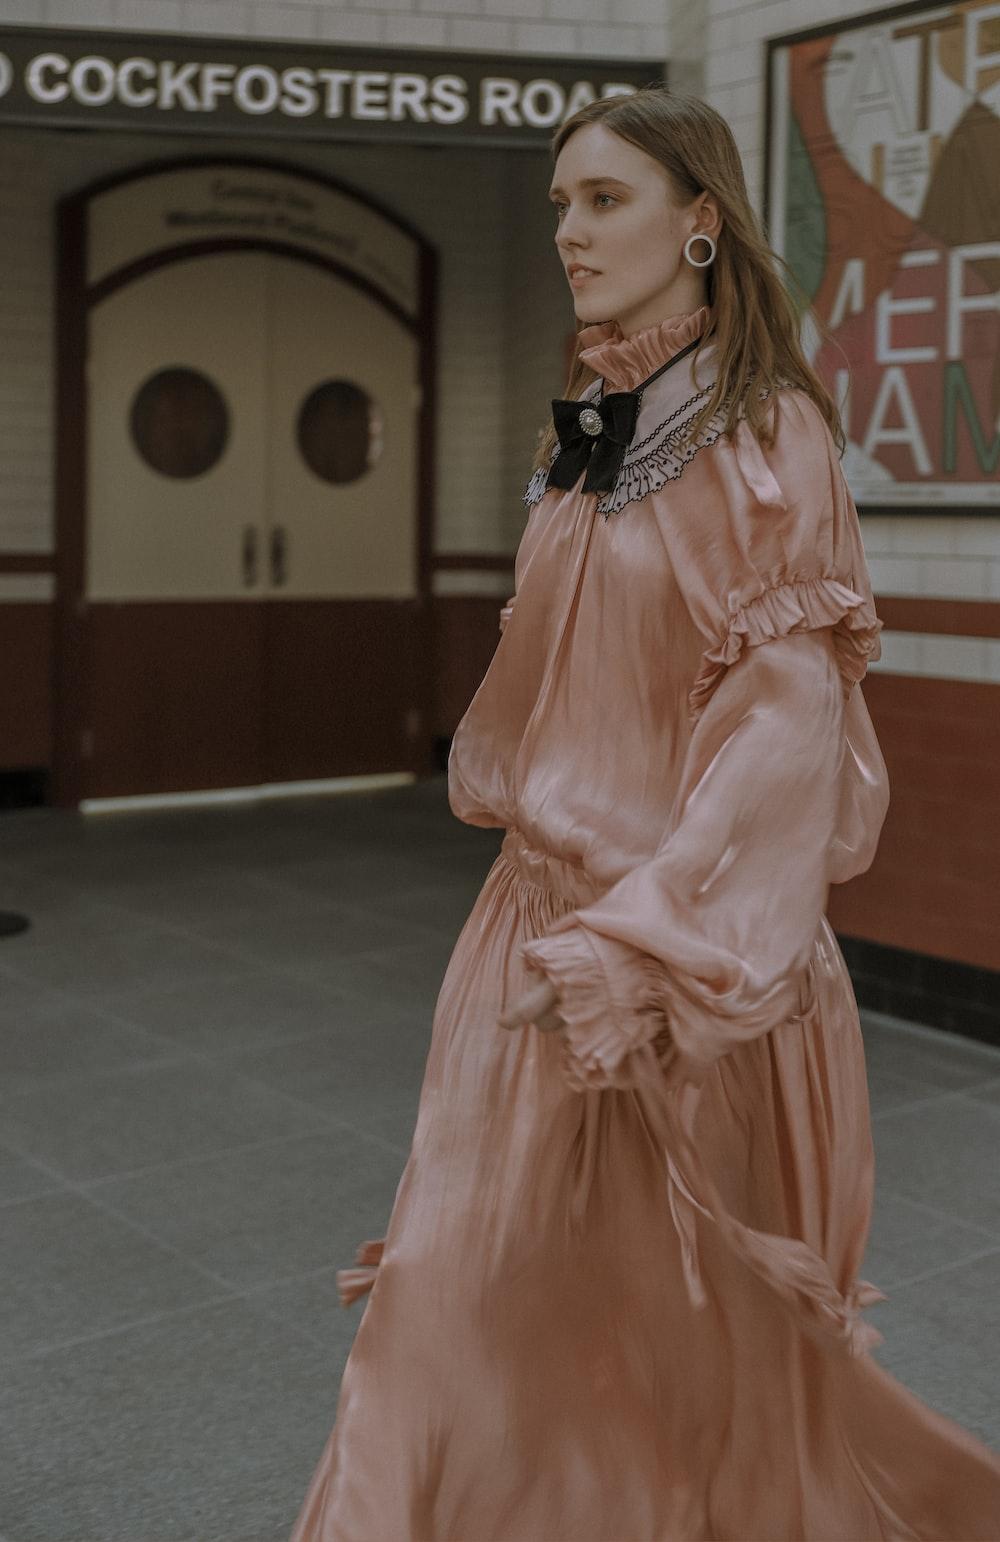 woman wearing pink long-sleeved dress across white door